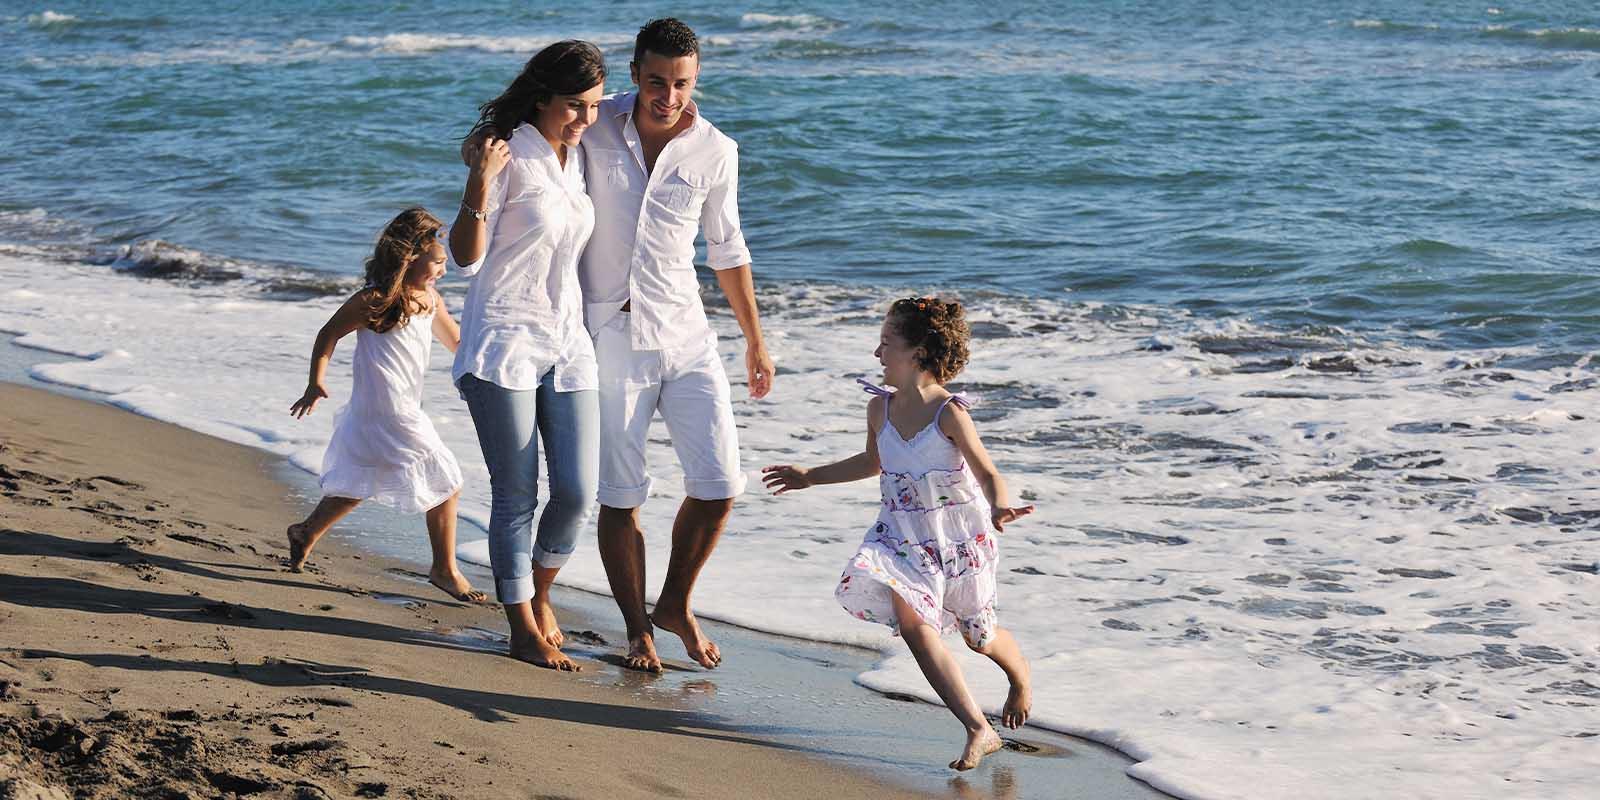 Family enjoys the beach in Grenada